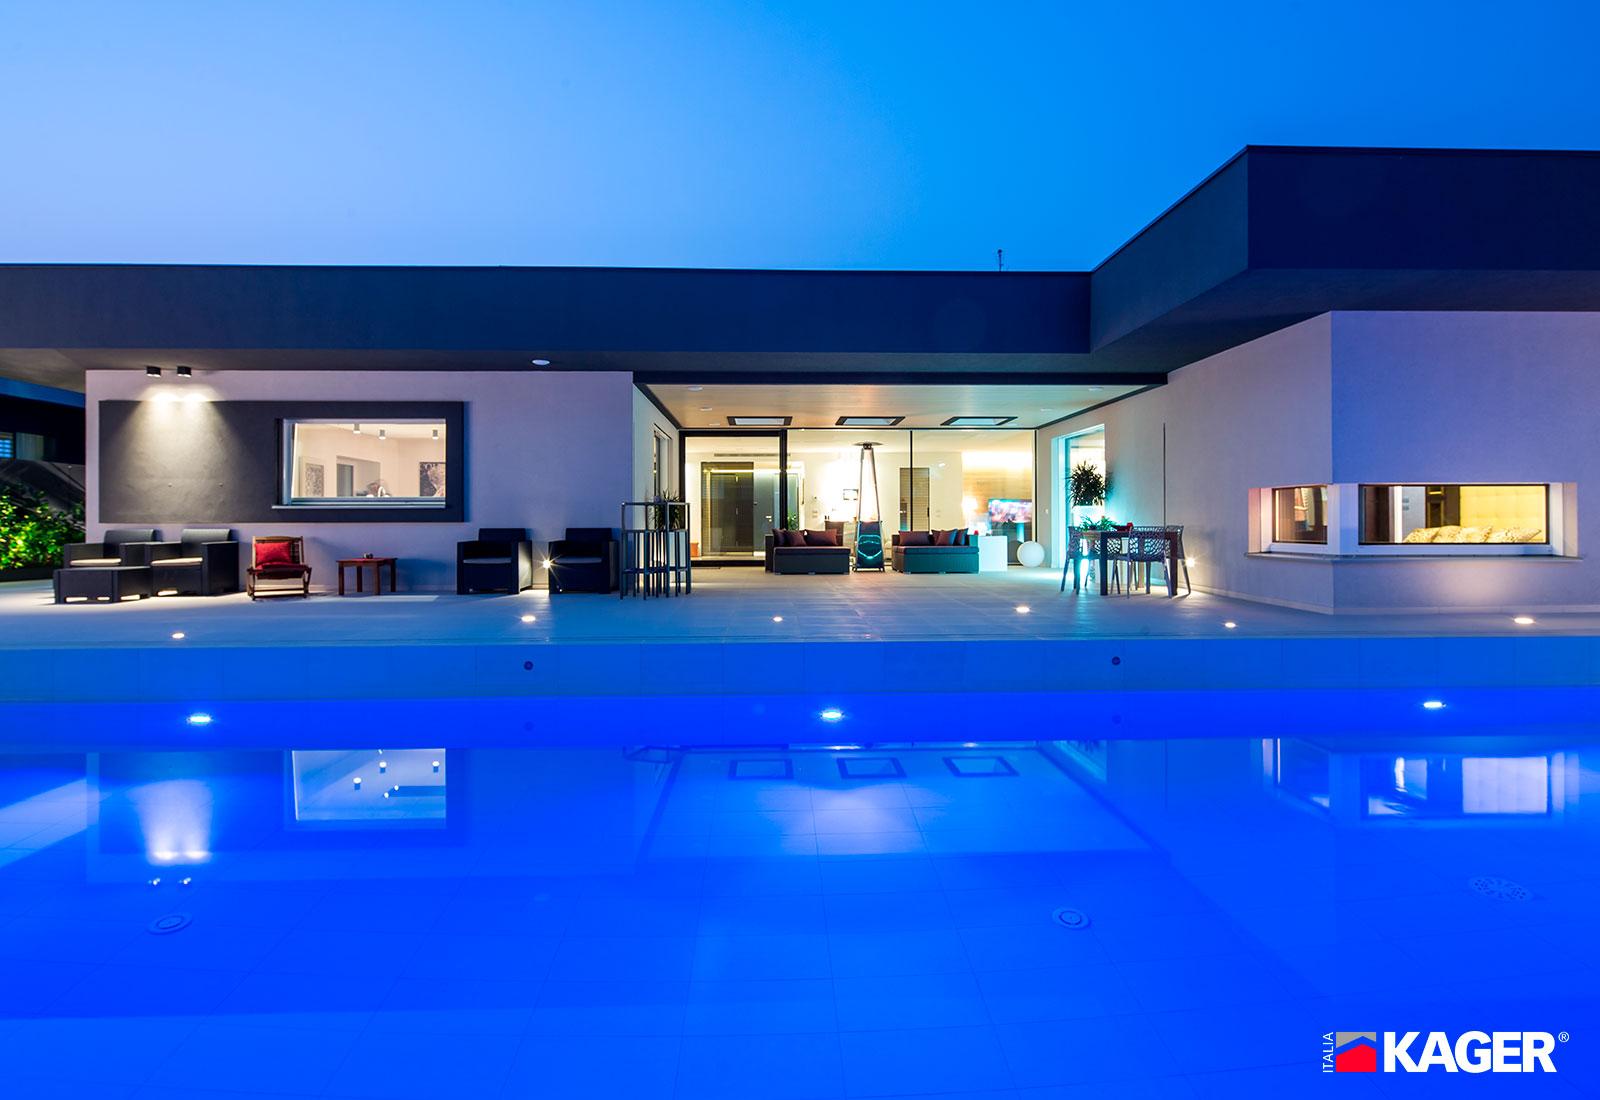 Casa-in-legno-Oppeano-Verona-Kager-Italia-23